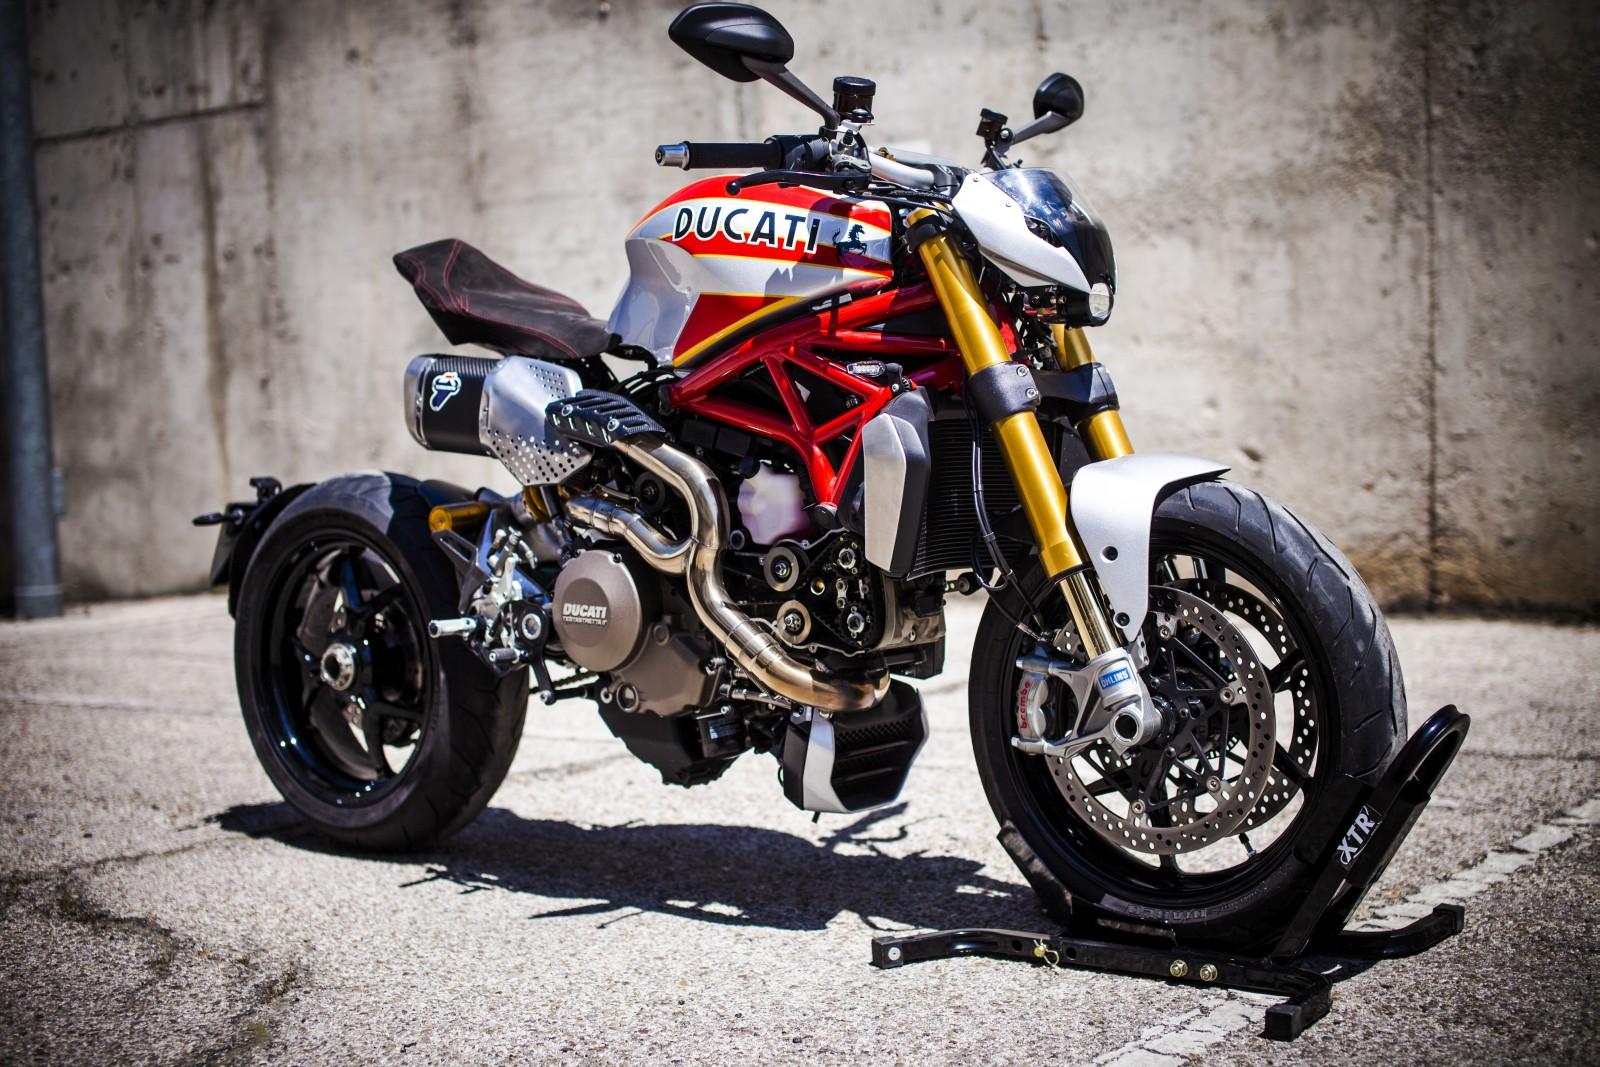 Customised Ducati Monster 1200 - XTR Pepo Siluro (11)